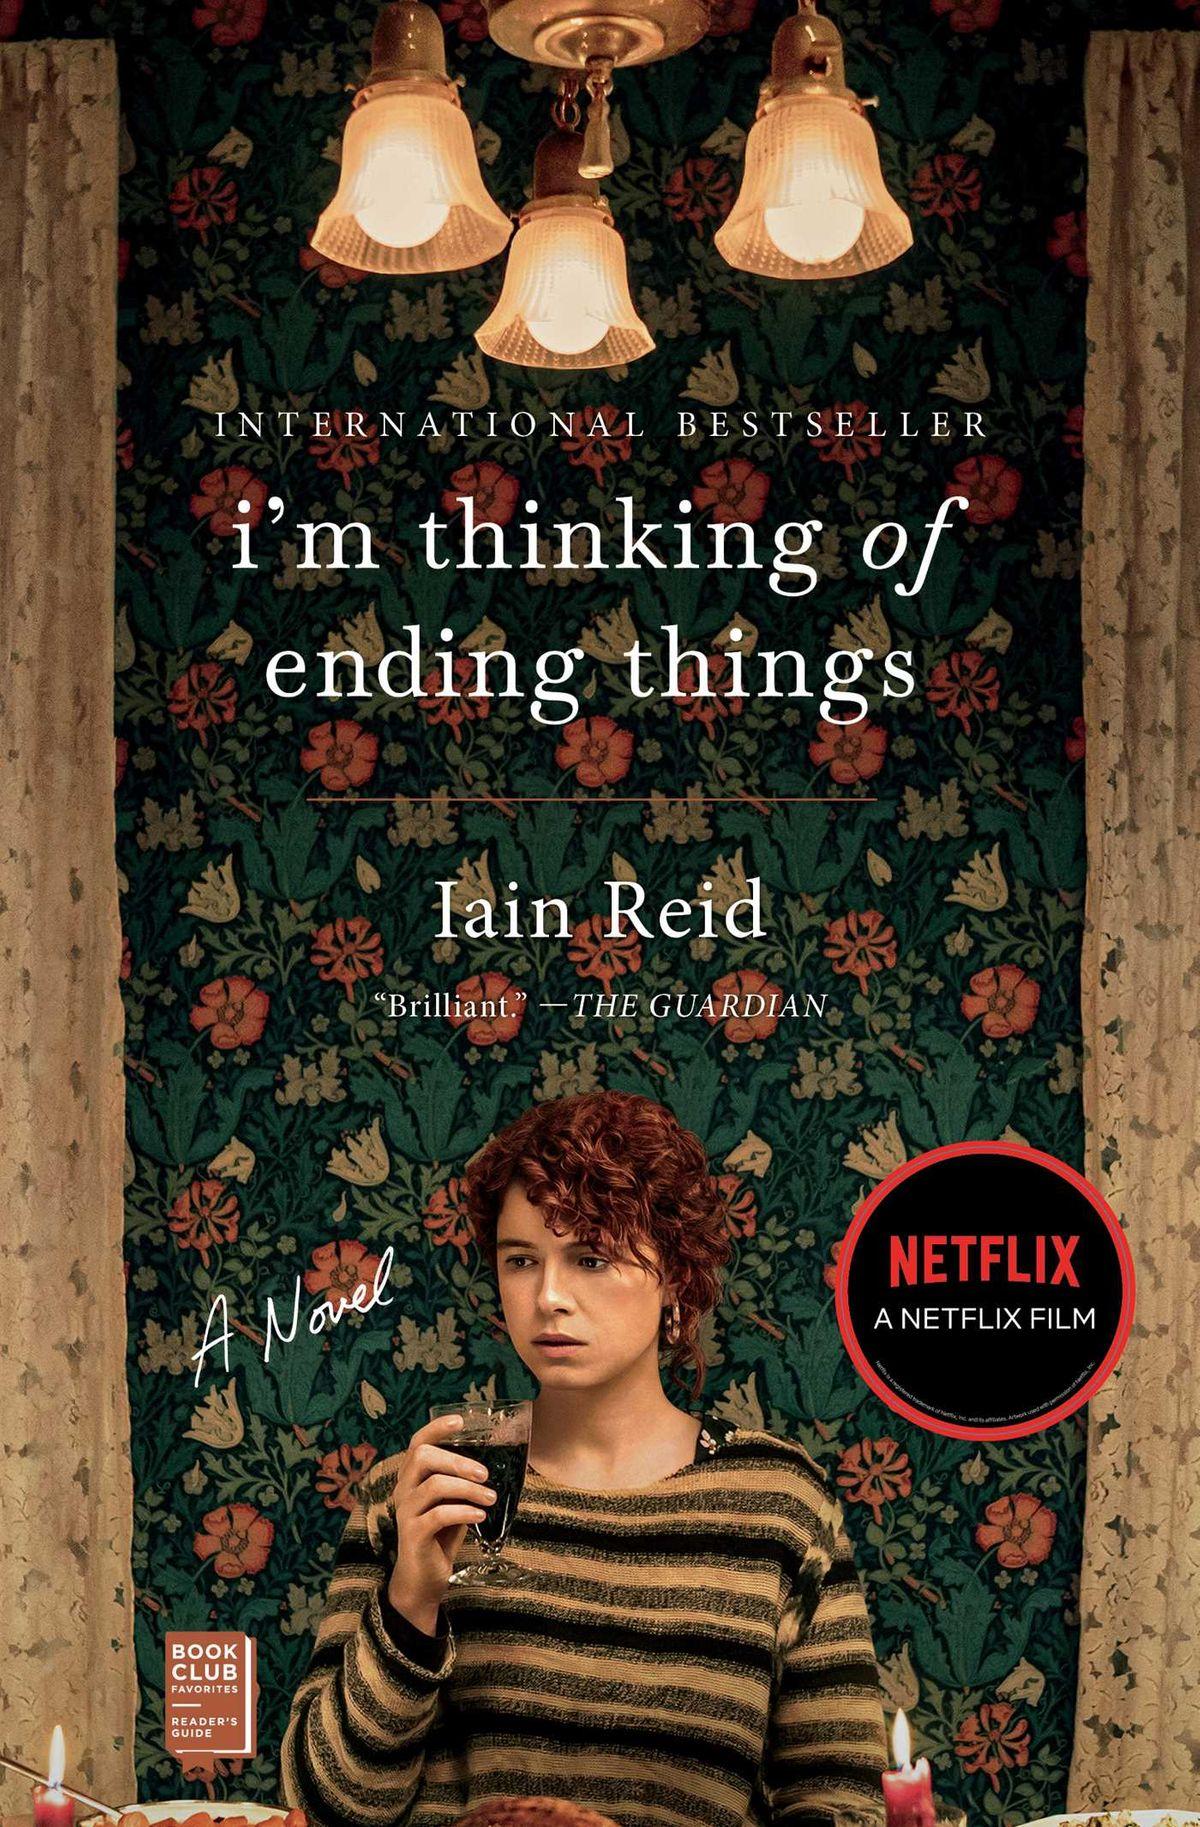 I'm Thinking of Ending Things by Iain Reid